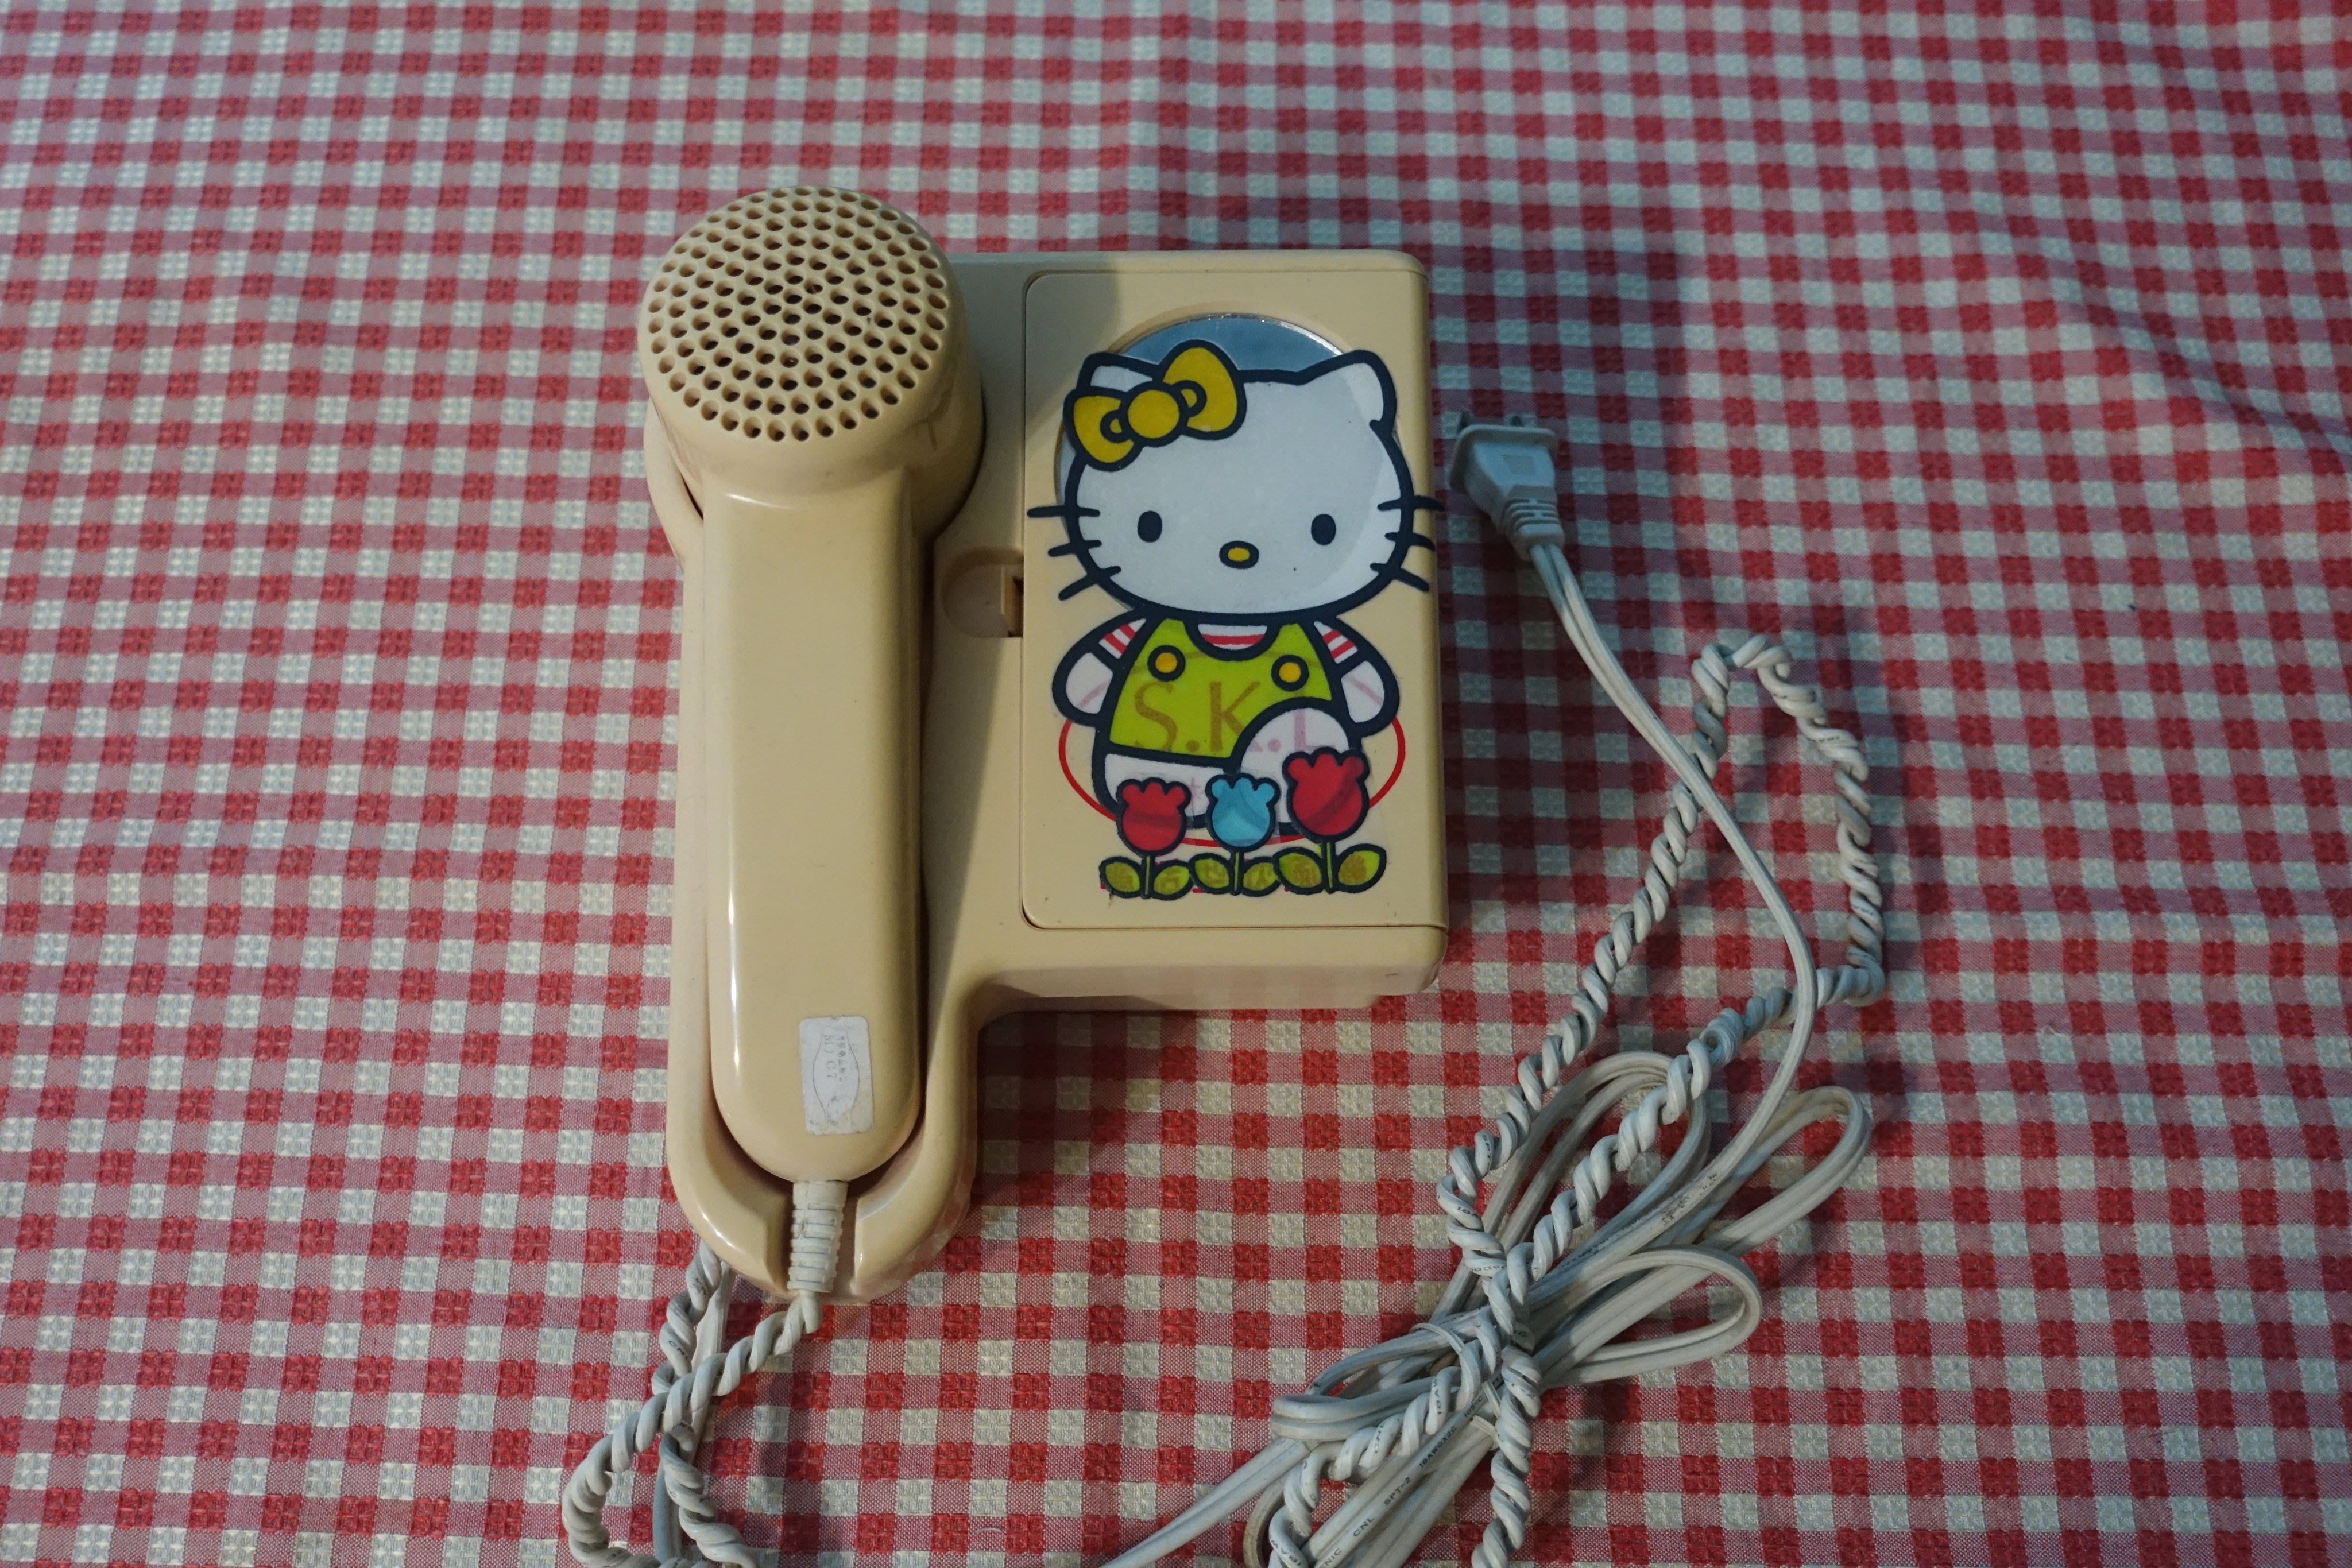 [C.M.平價精品館]SKL擺掛兩用附置物盒電話式吹風機  內含吹風機可卸式吹嘴